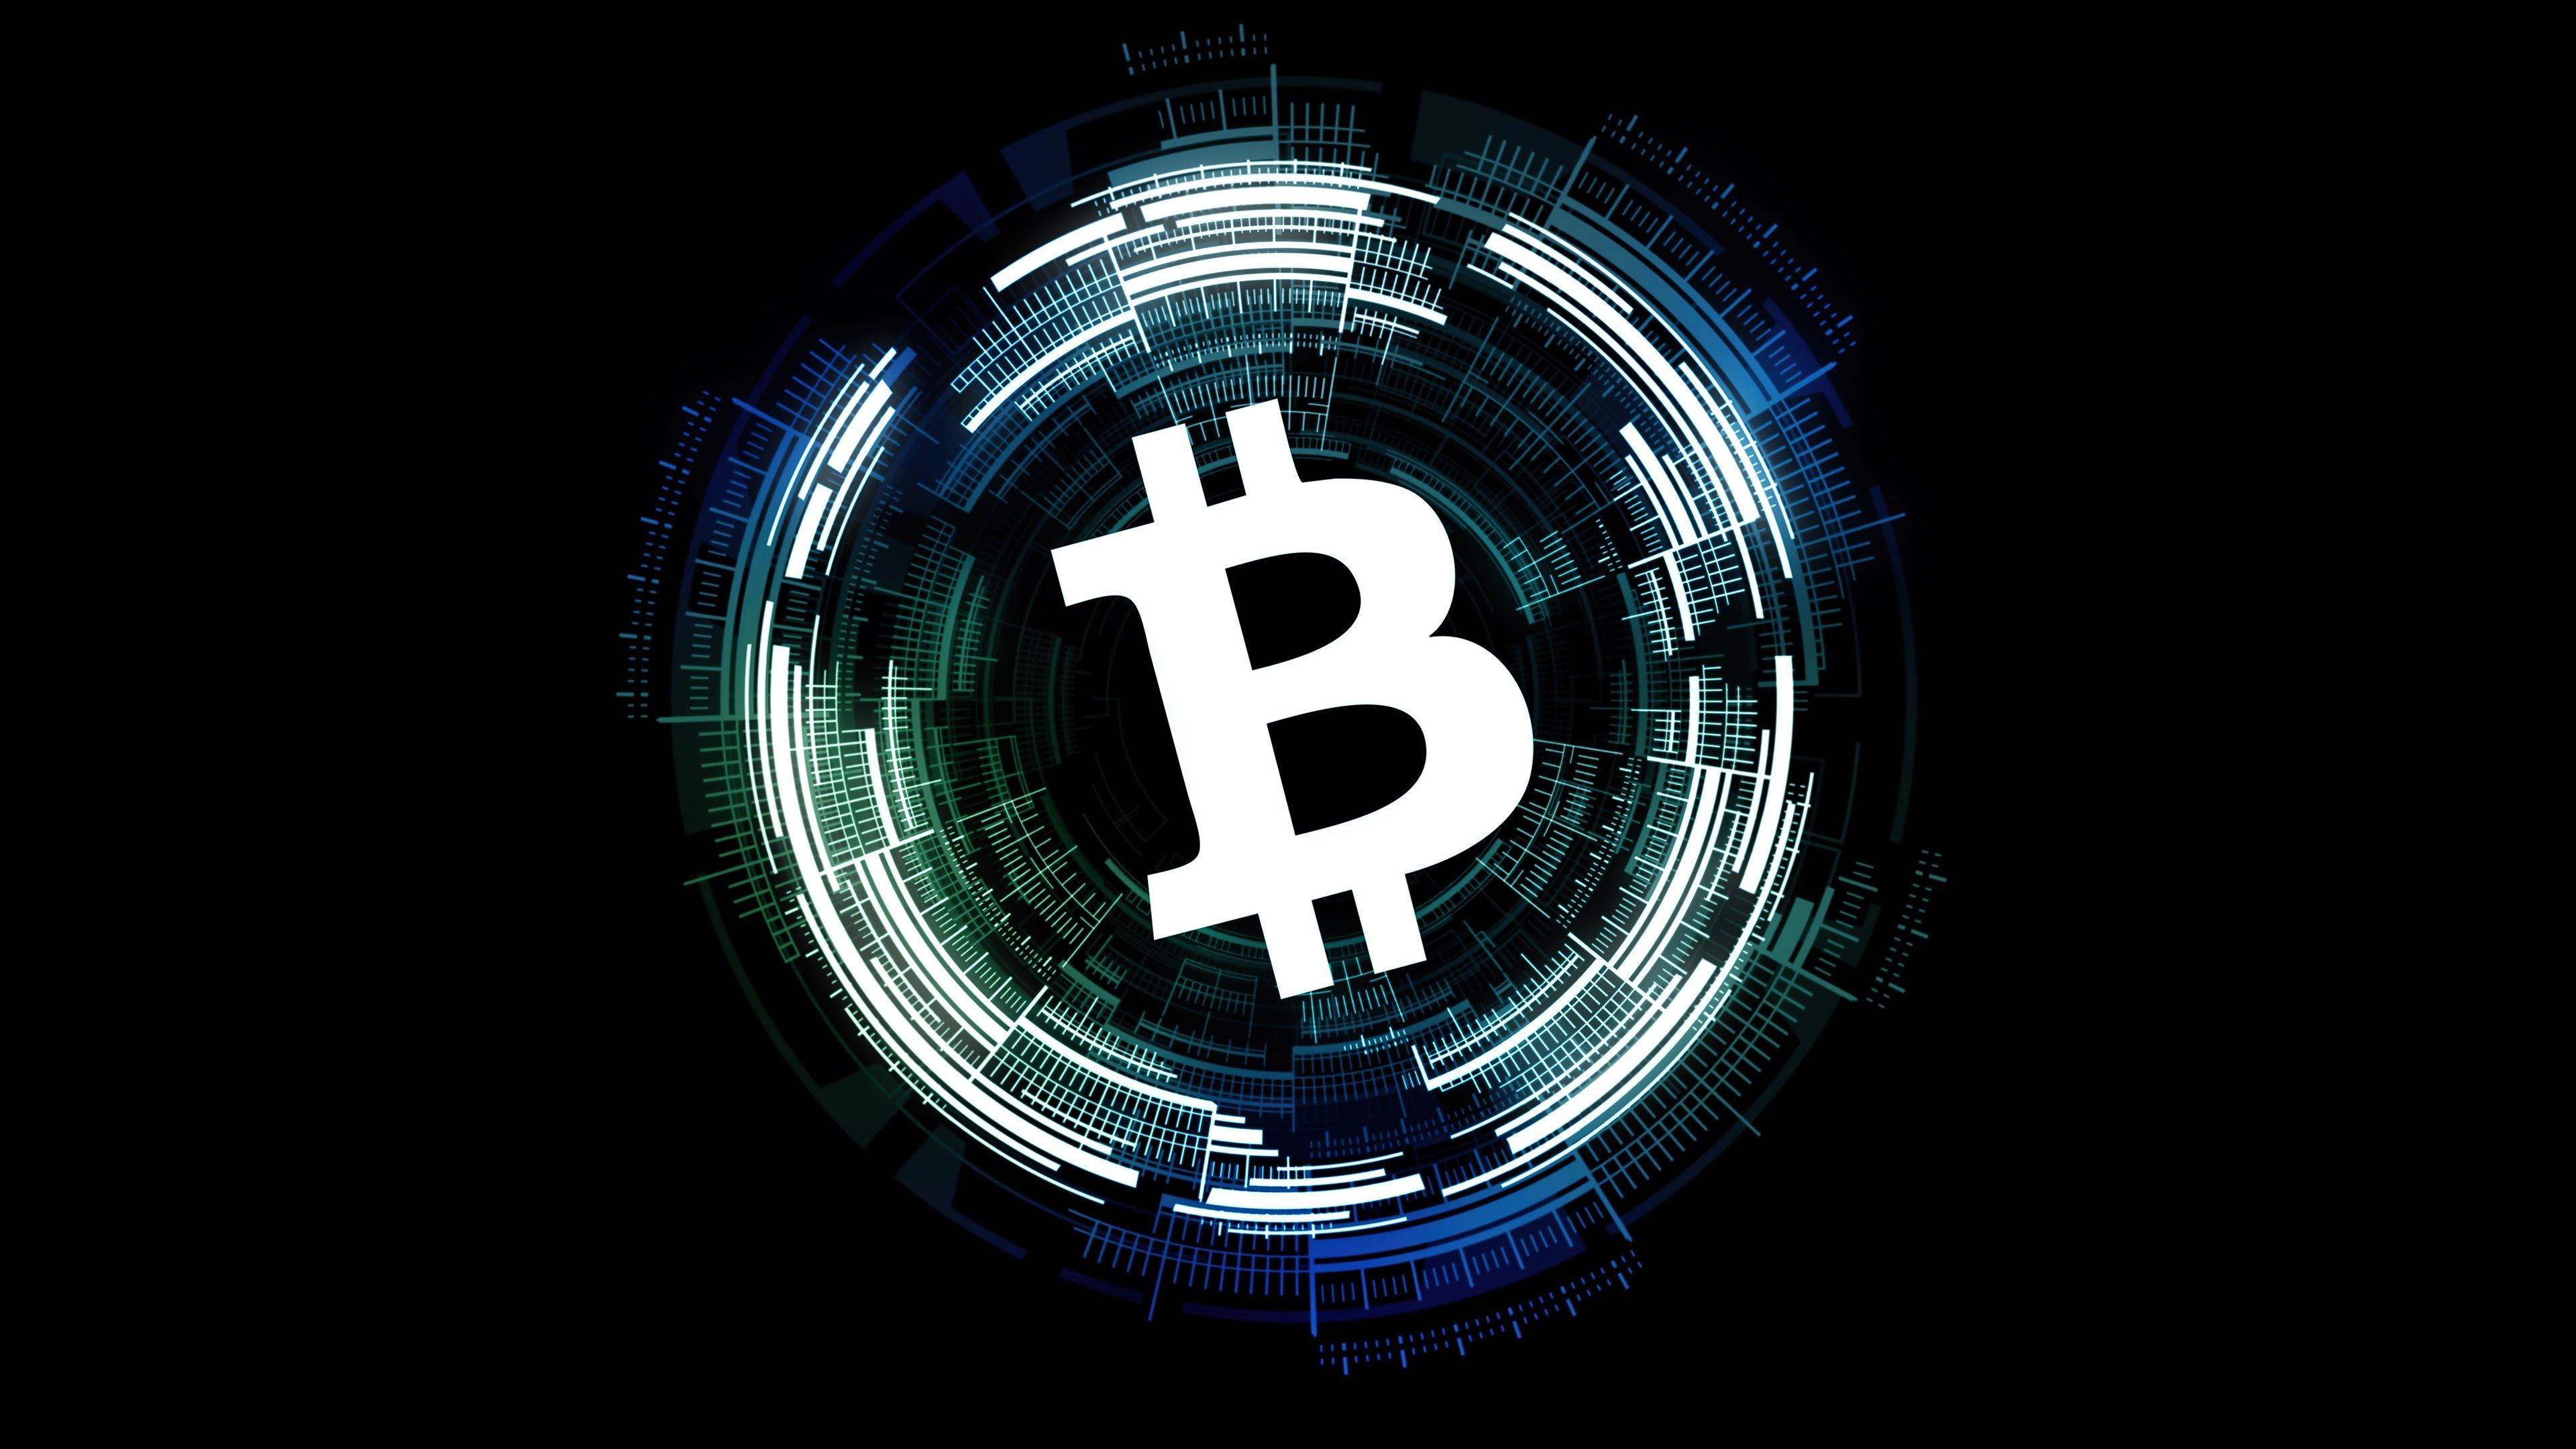 Wallpaper Bitcoin Sign